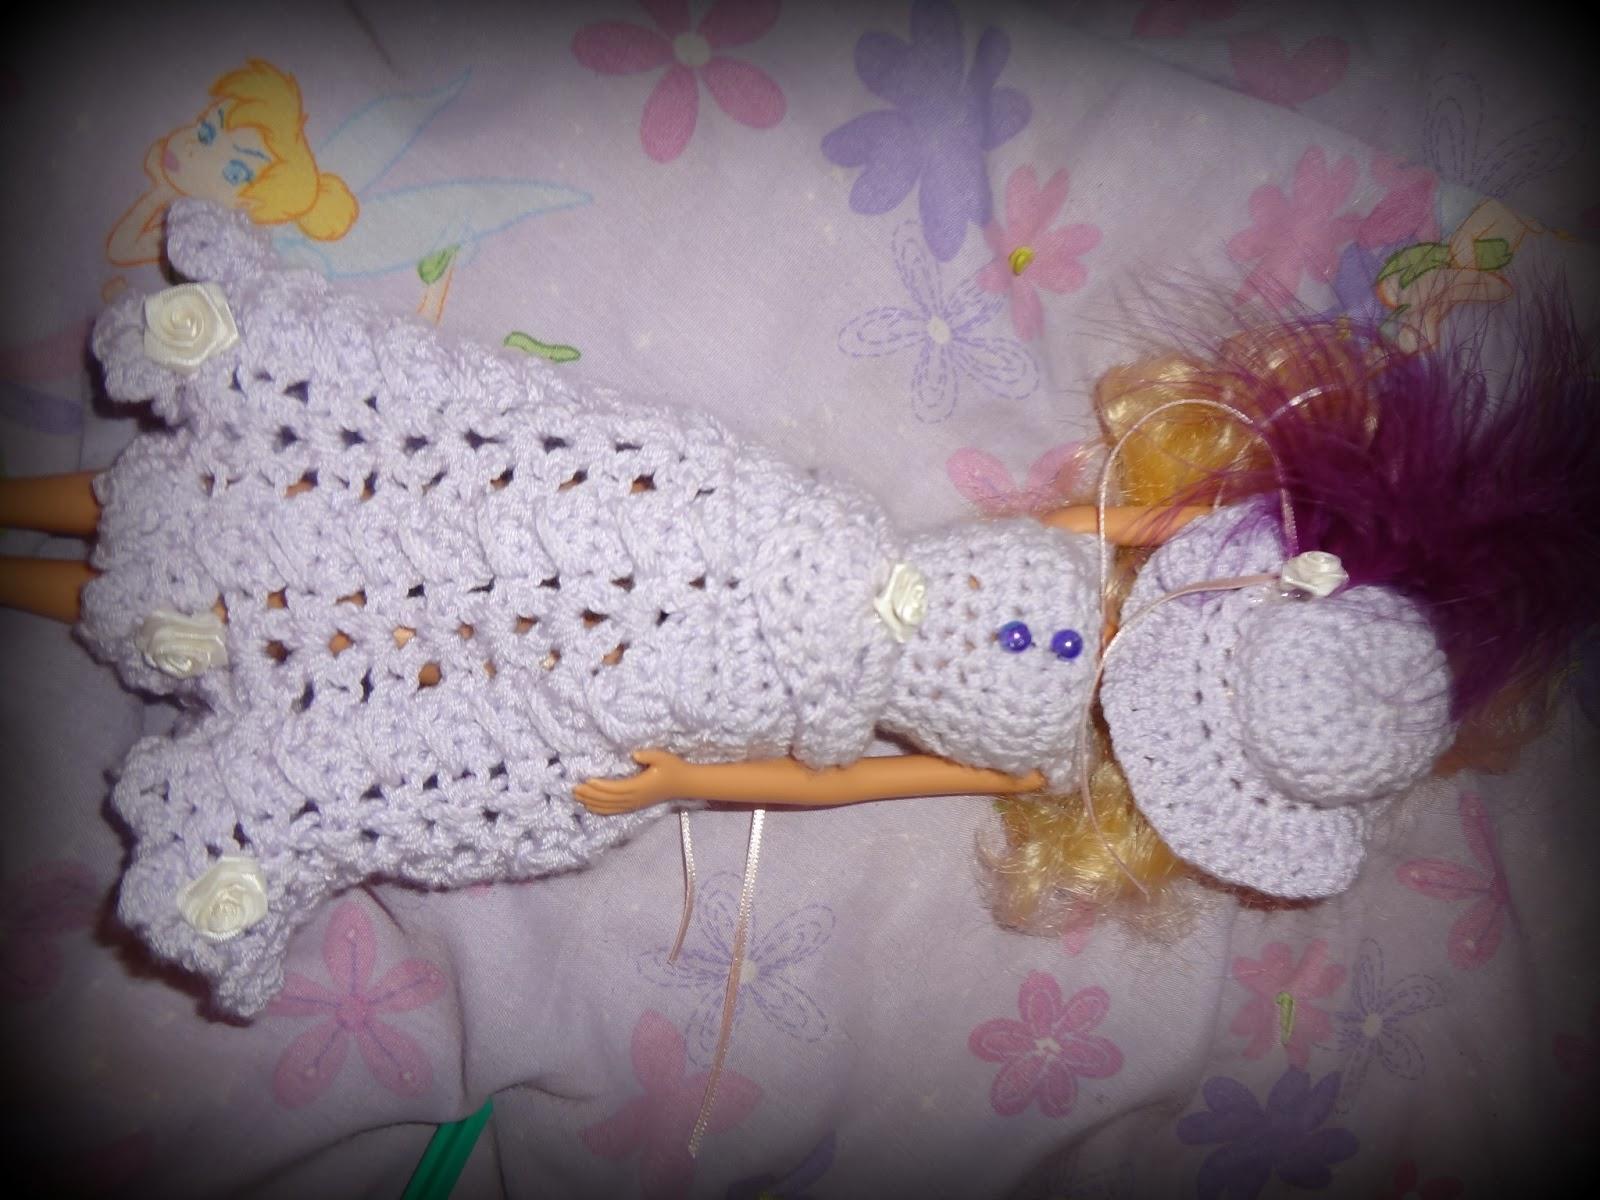 Free Crochet Patterns For Barbie Hats : Niftynnifers Crochet & Crafts: Crochet Barbie Hat Free ...